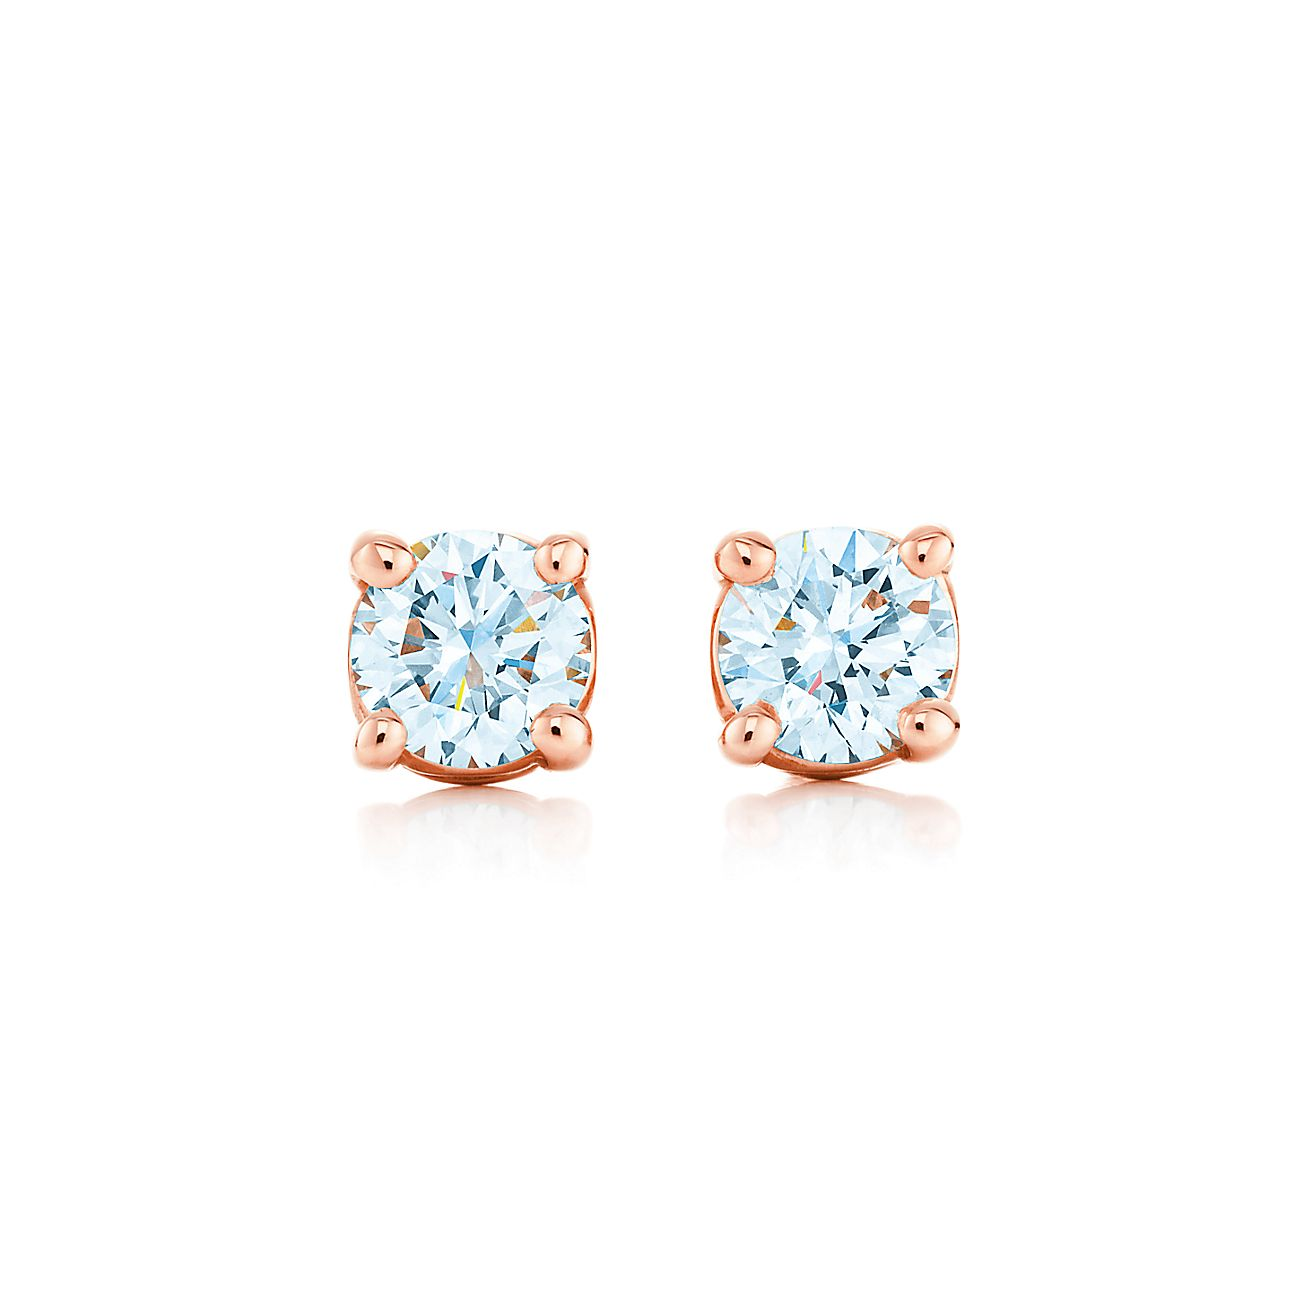 Tiffany Solitaire Diamond Earrings In 18k Rose Gold Tiffany Co